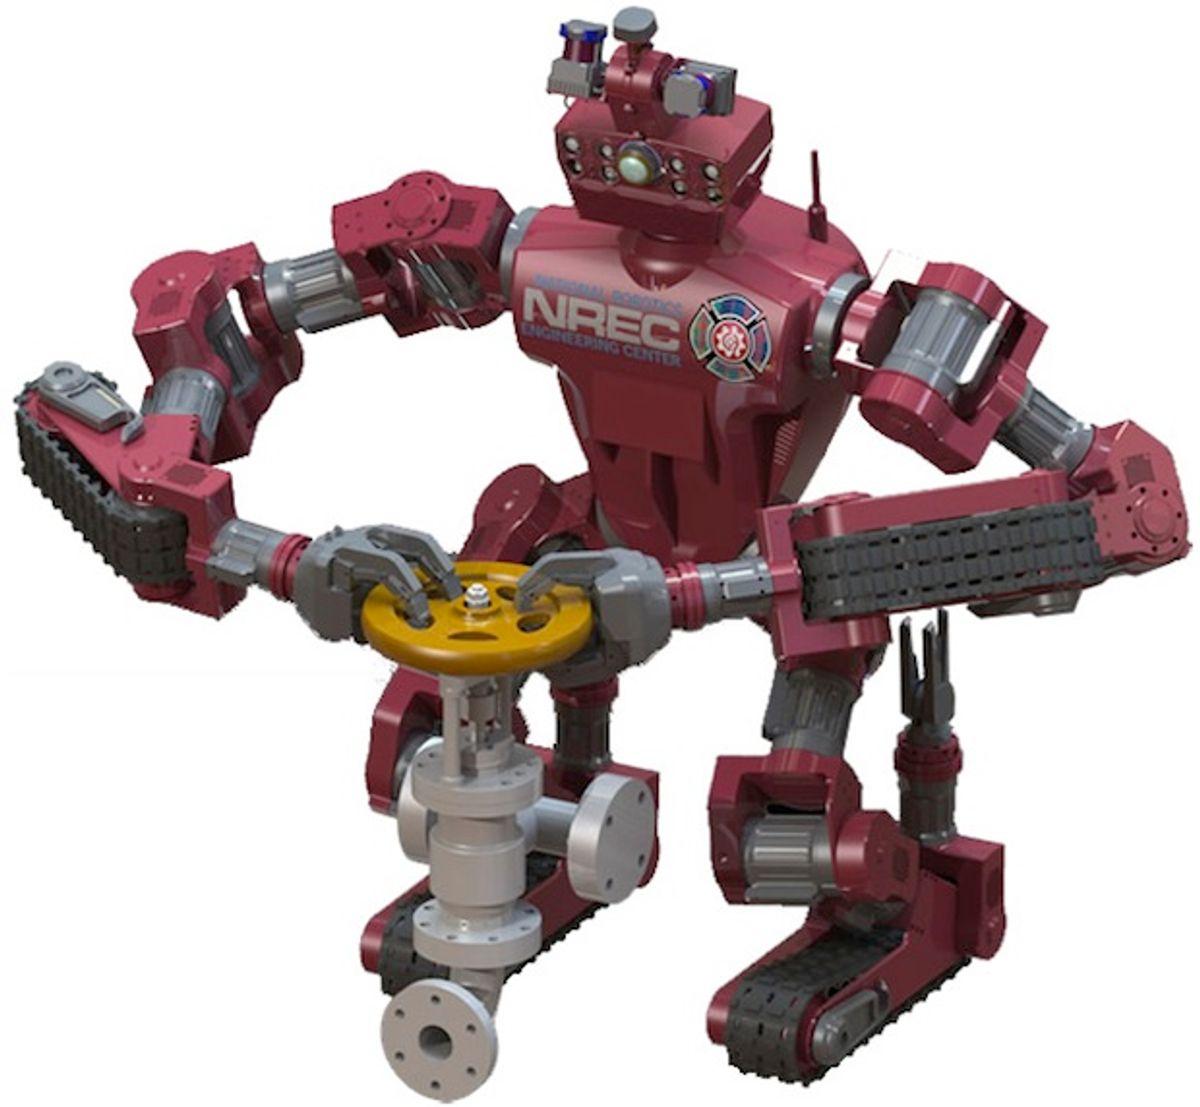 CMU's CHIMP Humanoid Robot Moves Like a Tank